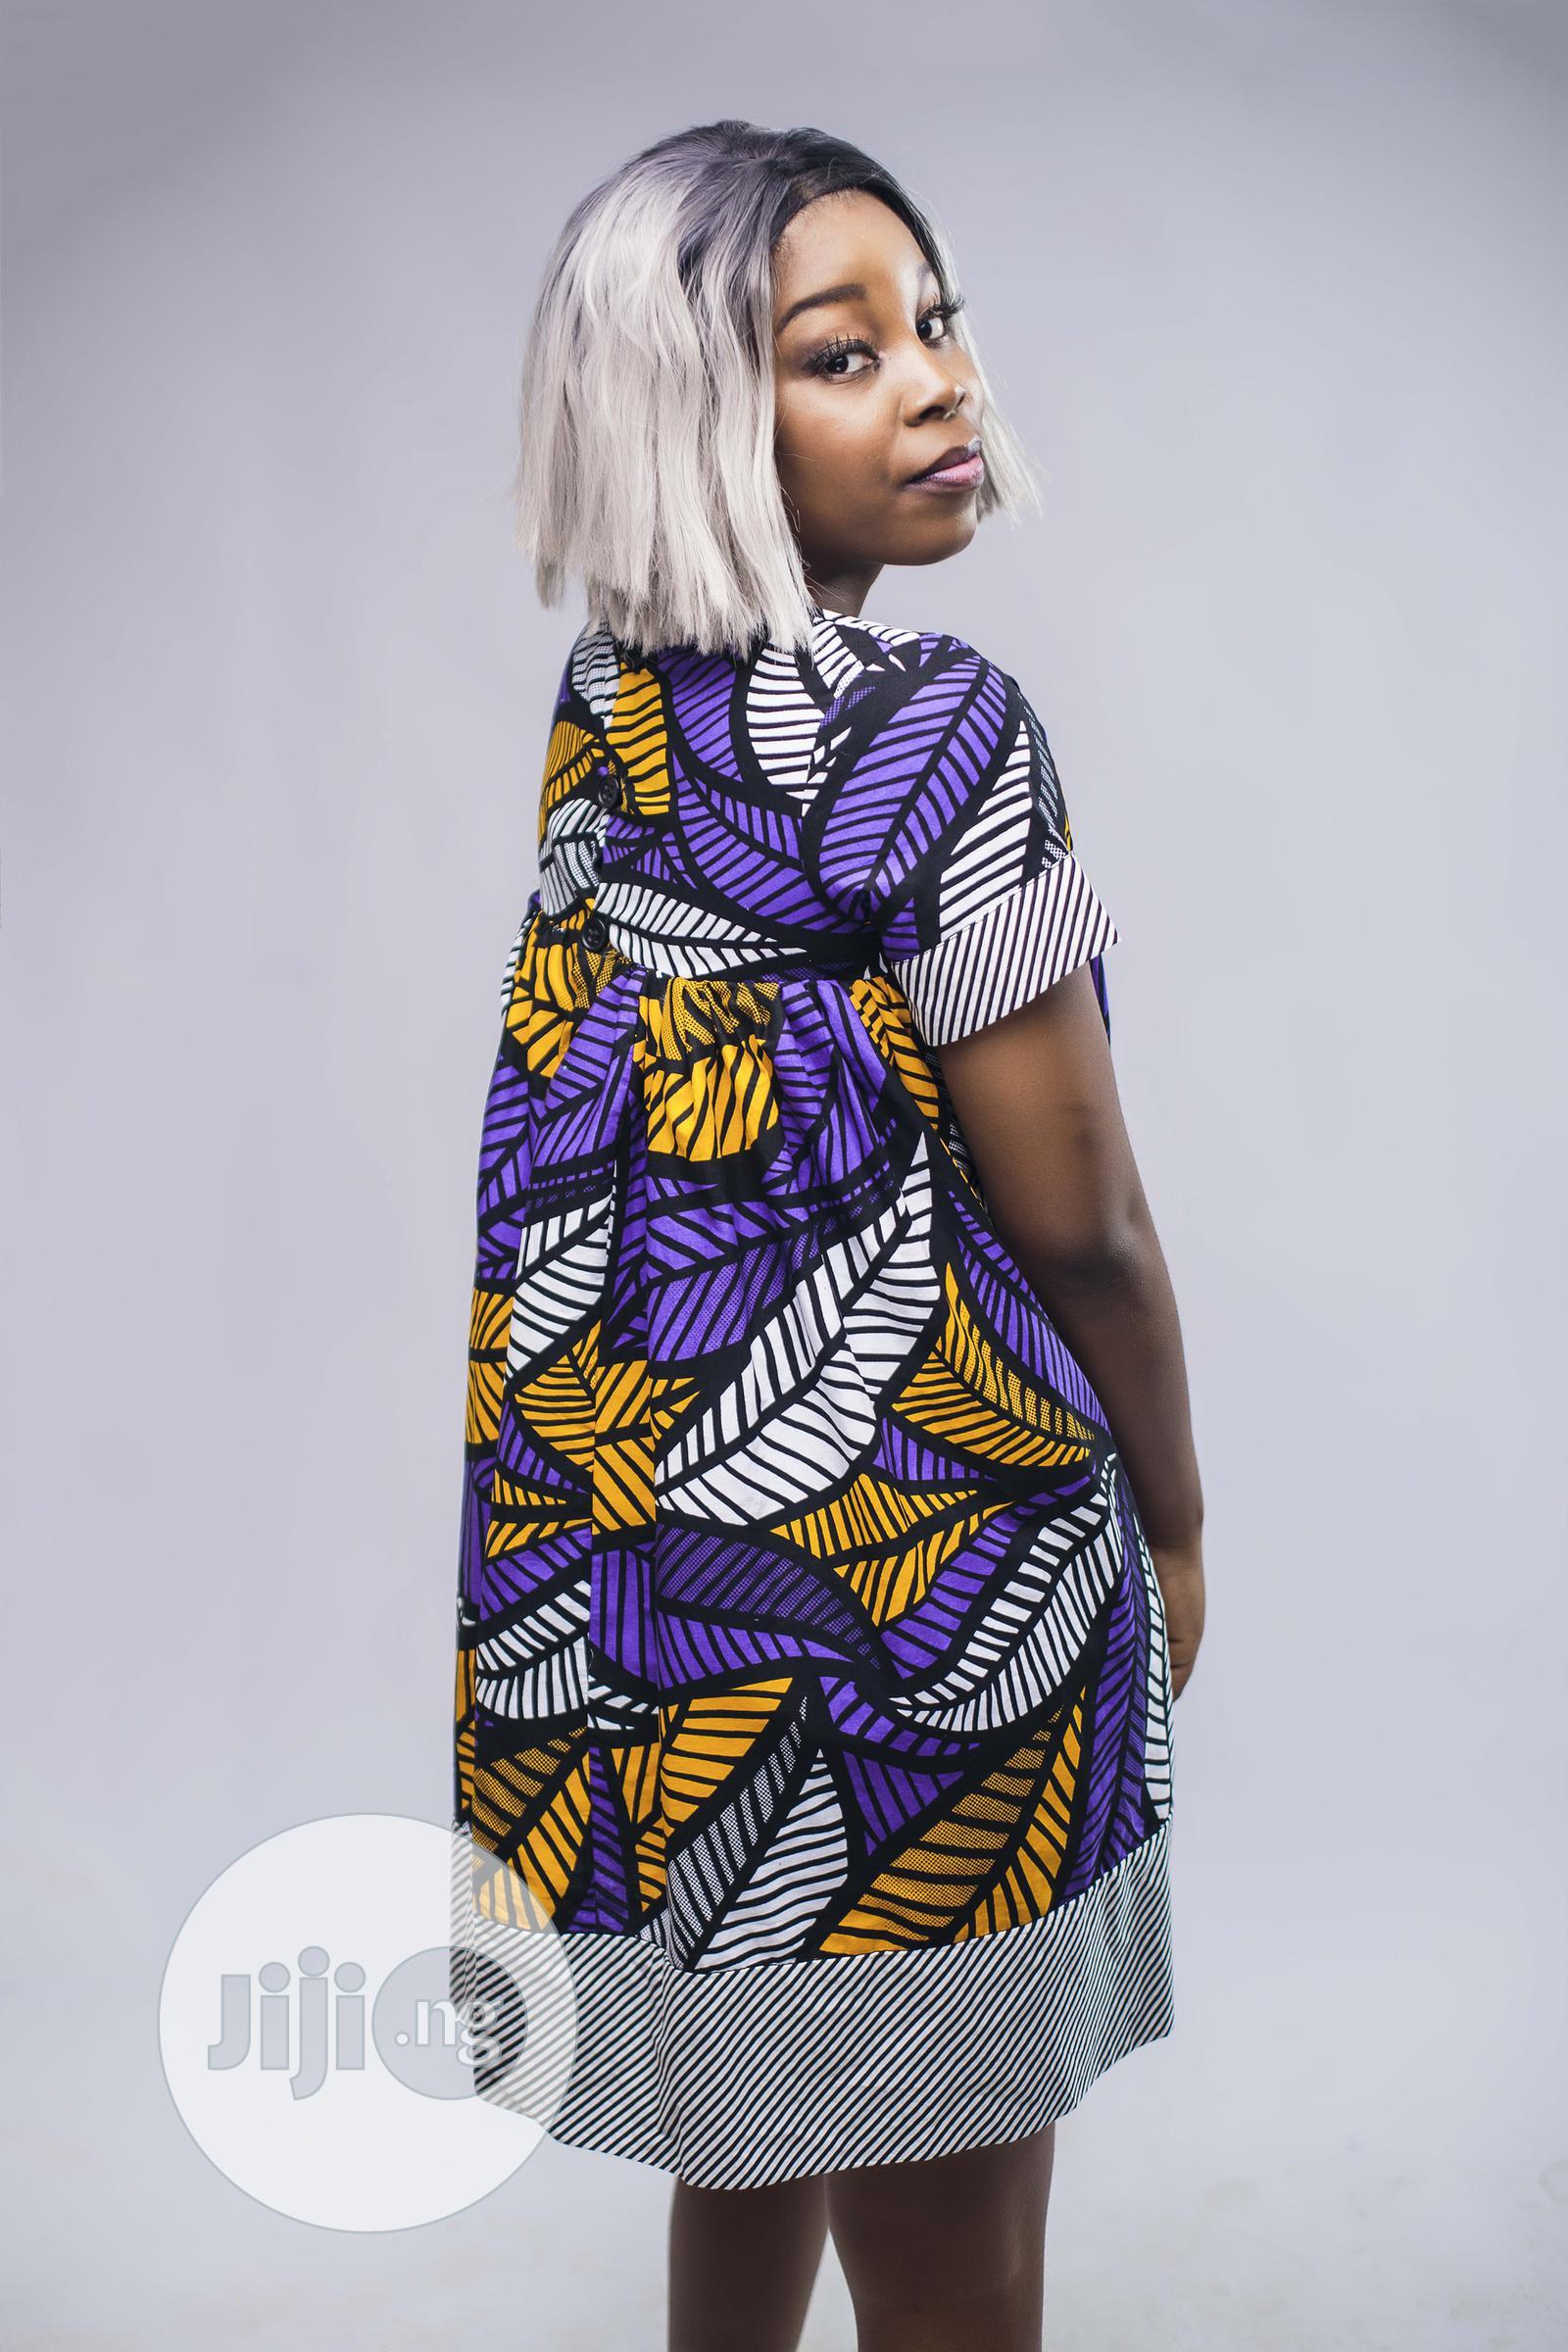 African Print Doll Dress, Ankara Short Dress, Purple | Clothing for sale in Yaba, Lagos State, Nigeria